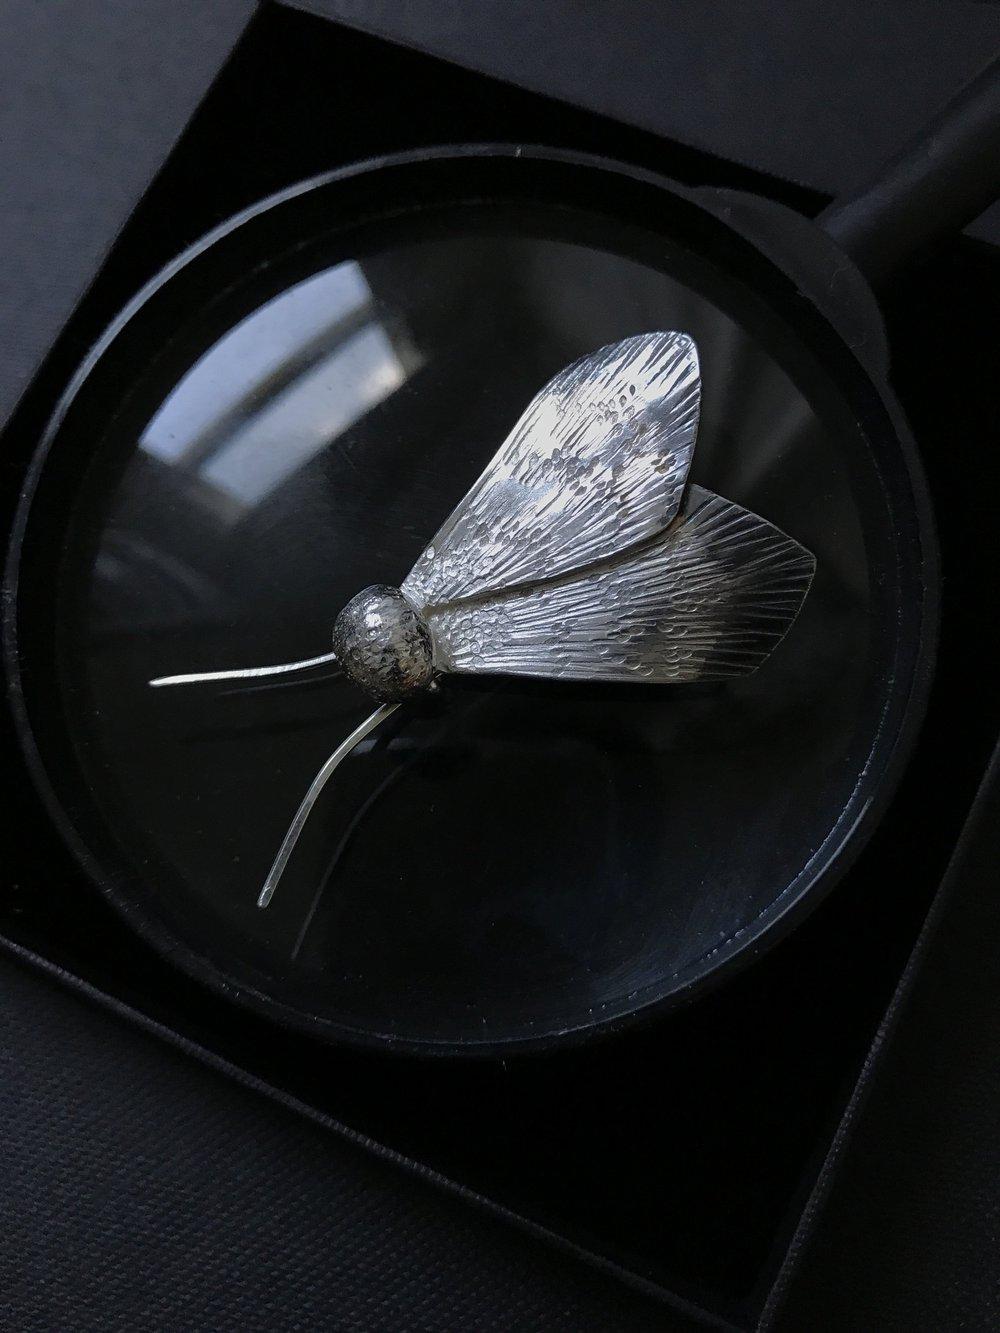 Tuesday Moth Brooch